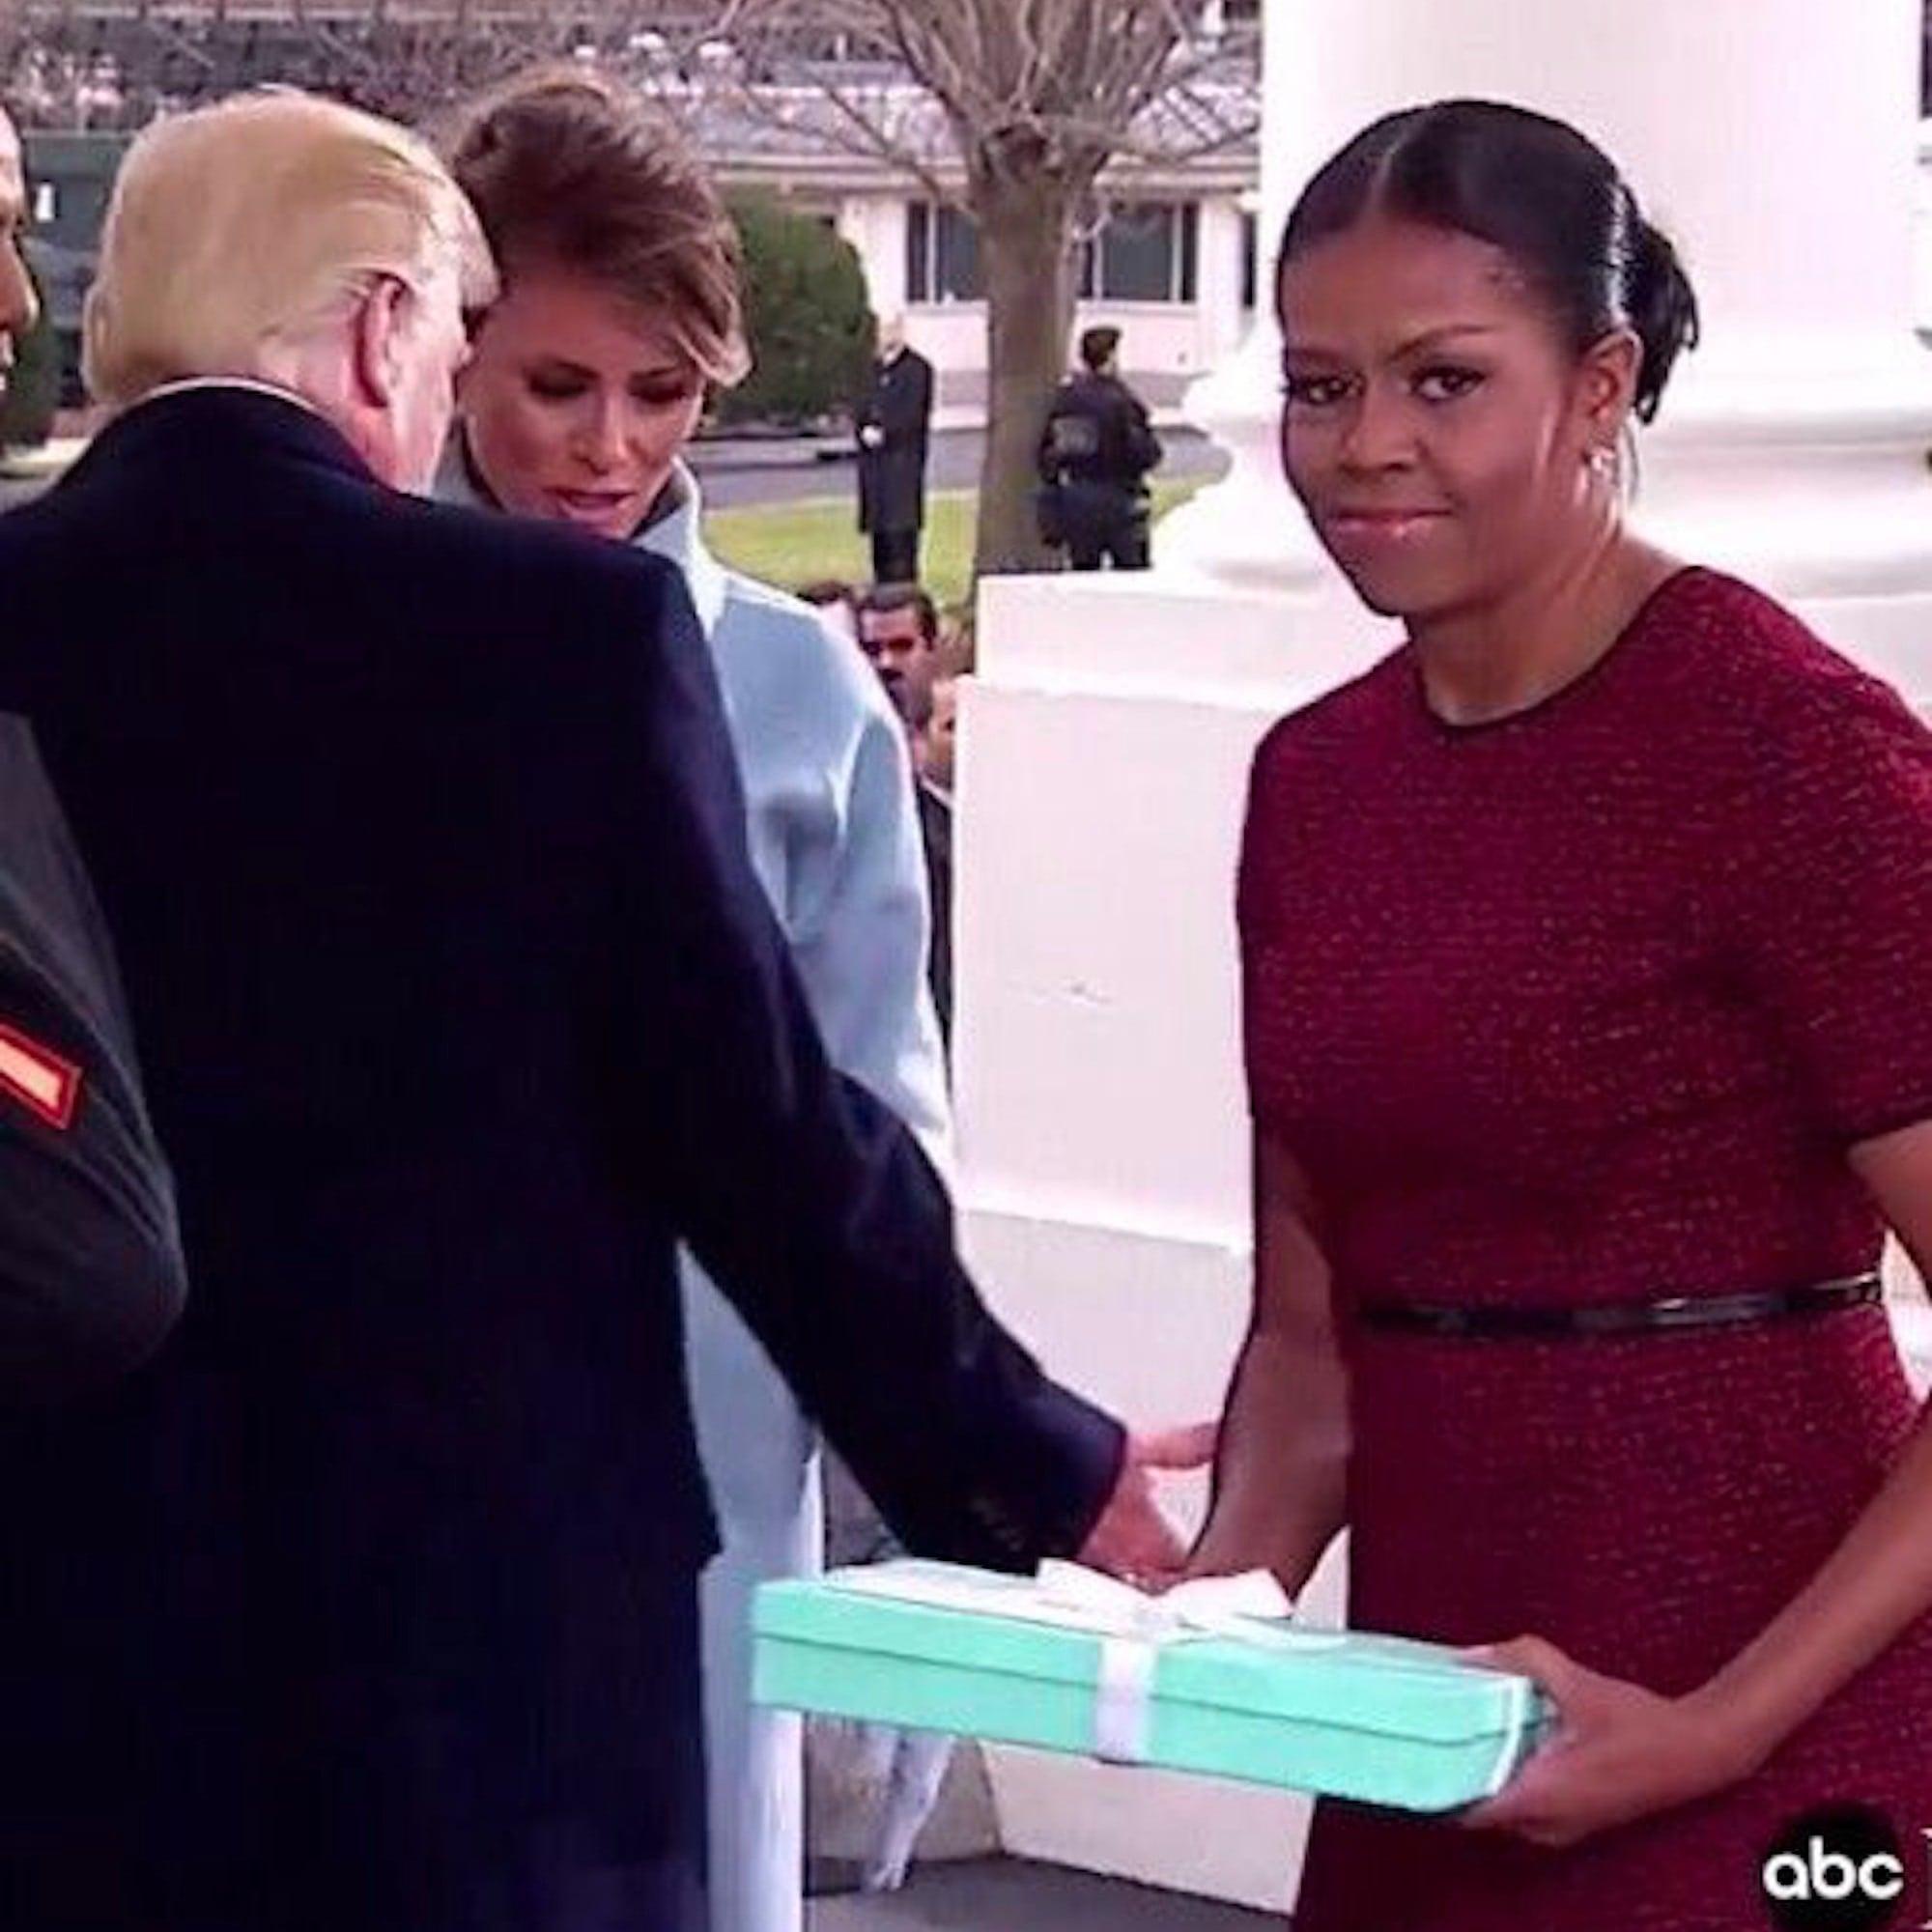 Michelle Obama's Reaction to Melania Trump's Gift | POPSUGAR ...